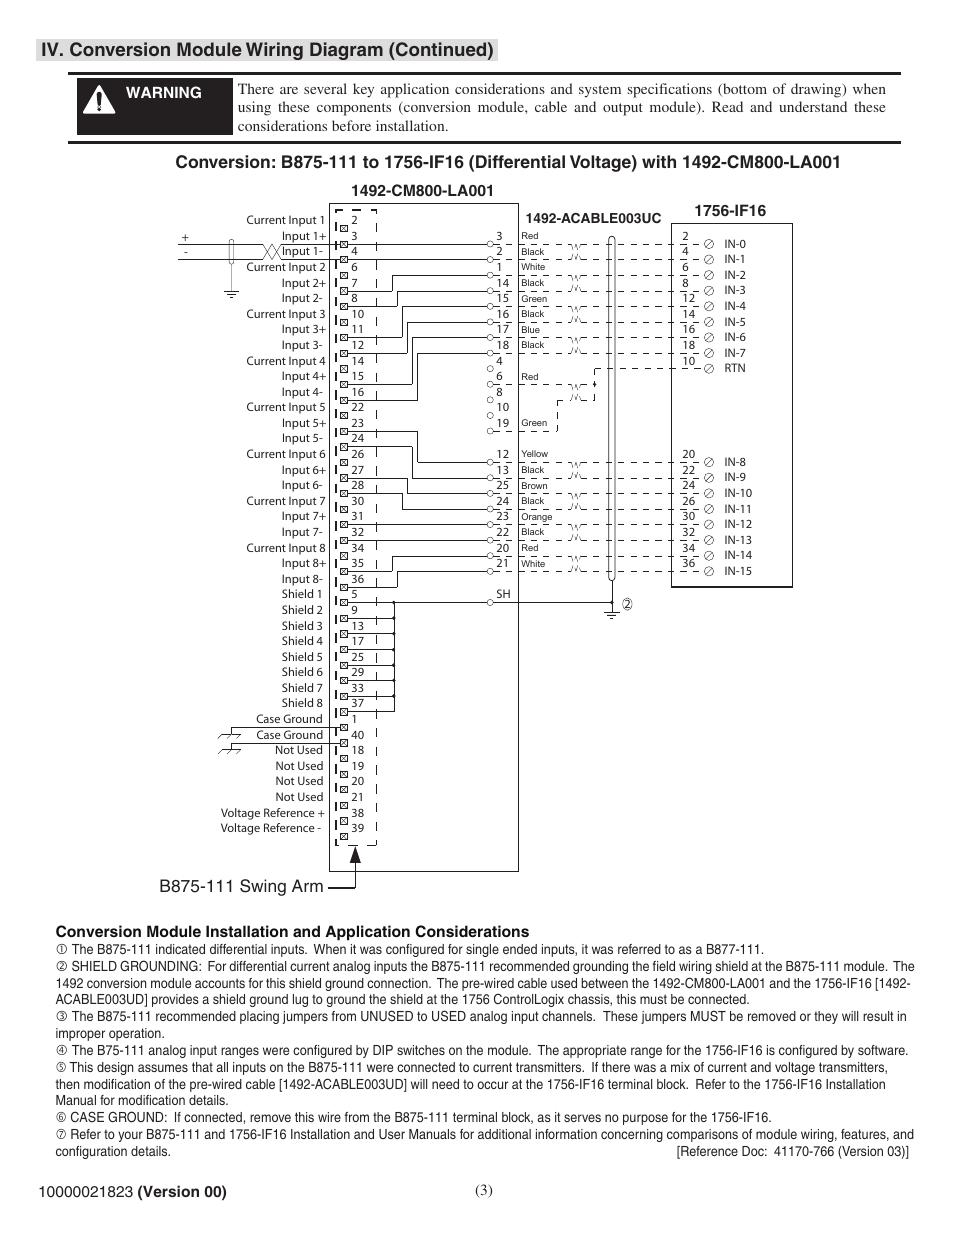 medium resolution of ifih wiring image wiring diagram 1756 if16h wiring 1756 auto wiring diagram schematic on 1756 if8ih